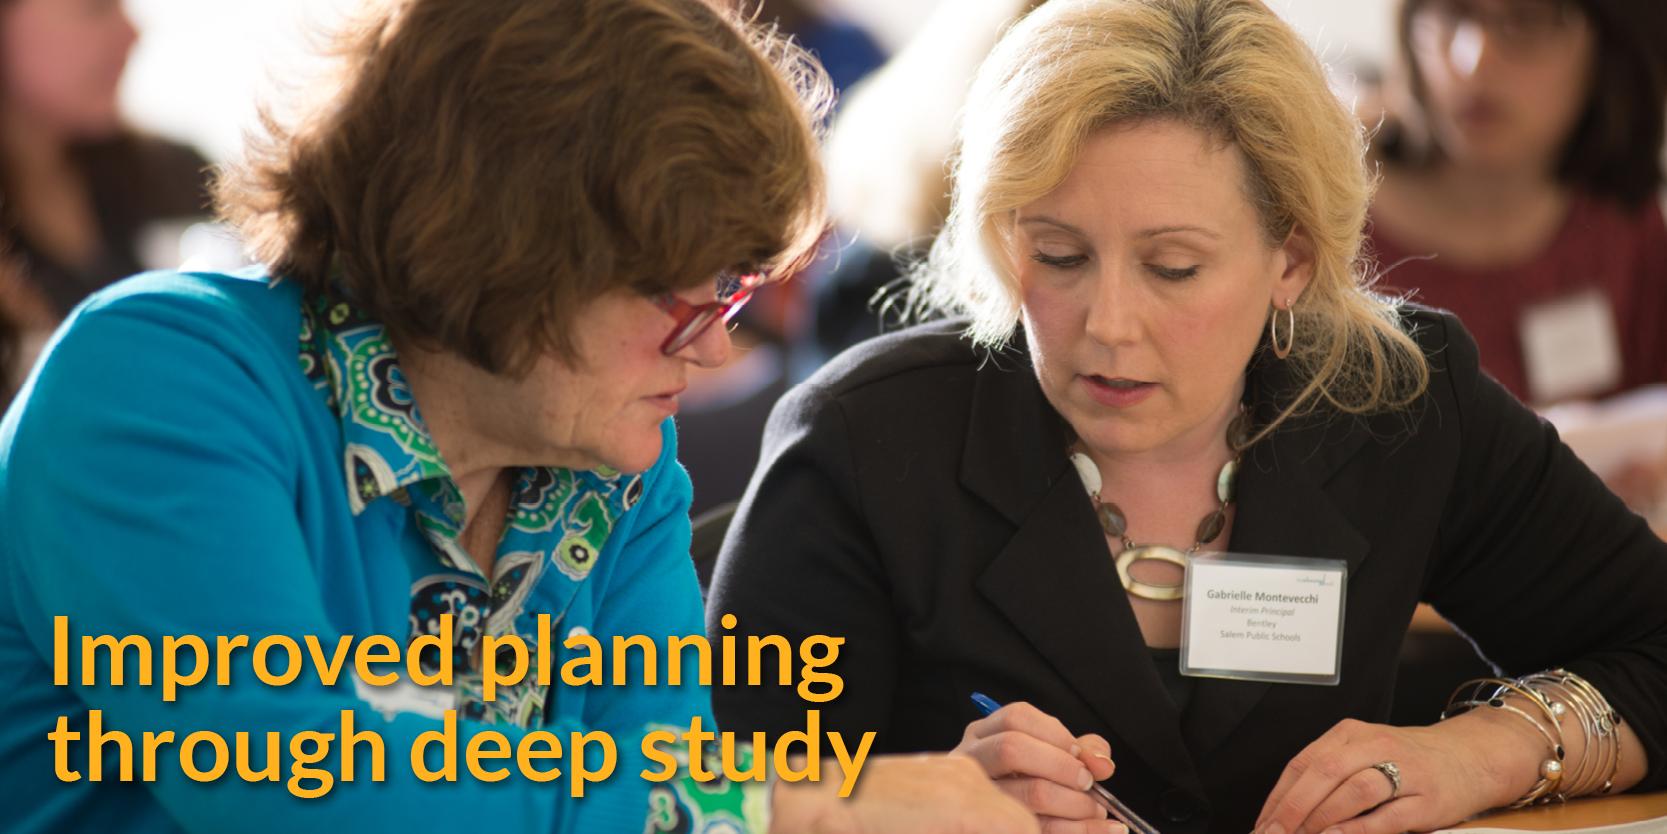 Improved planning through deep study